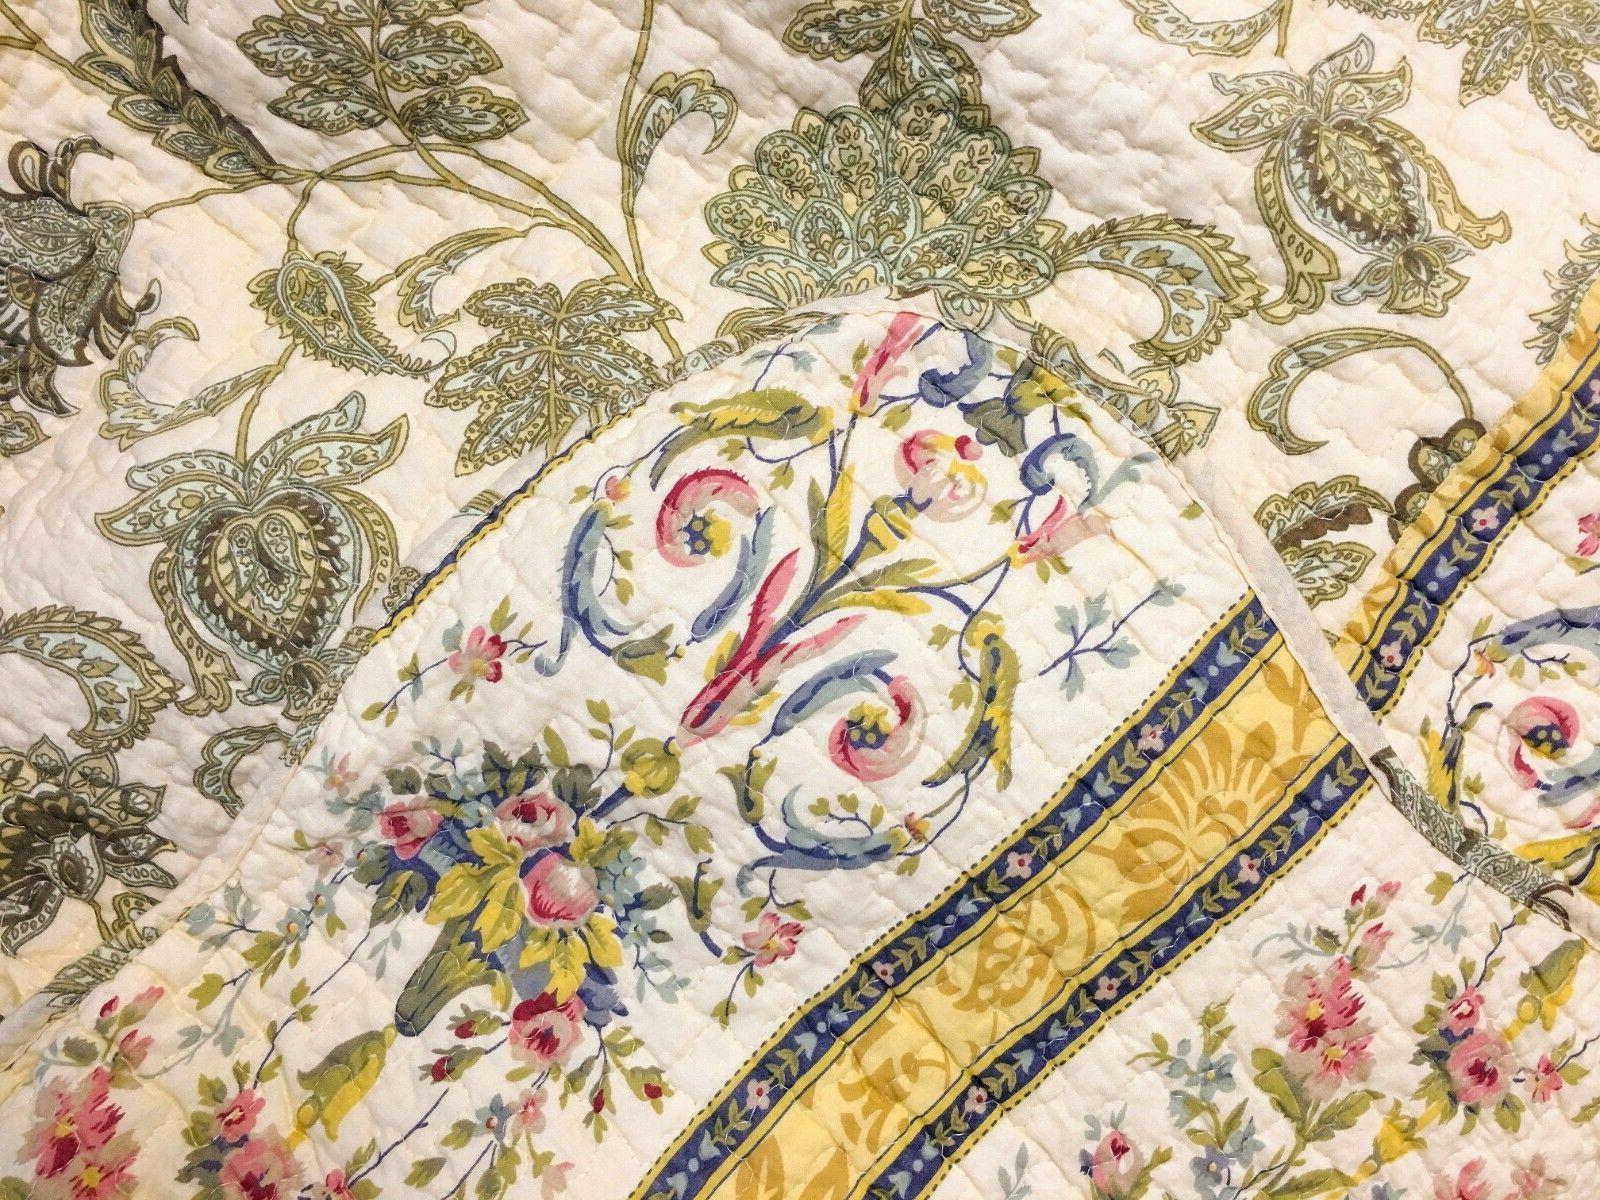 Florence 3 Reversible Cotton Set, Coverlet